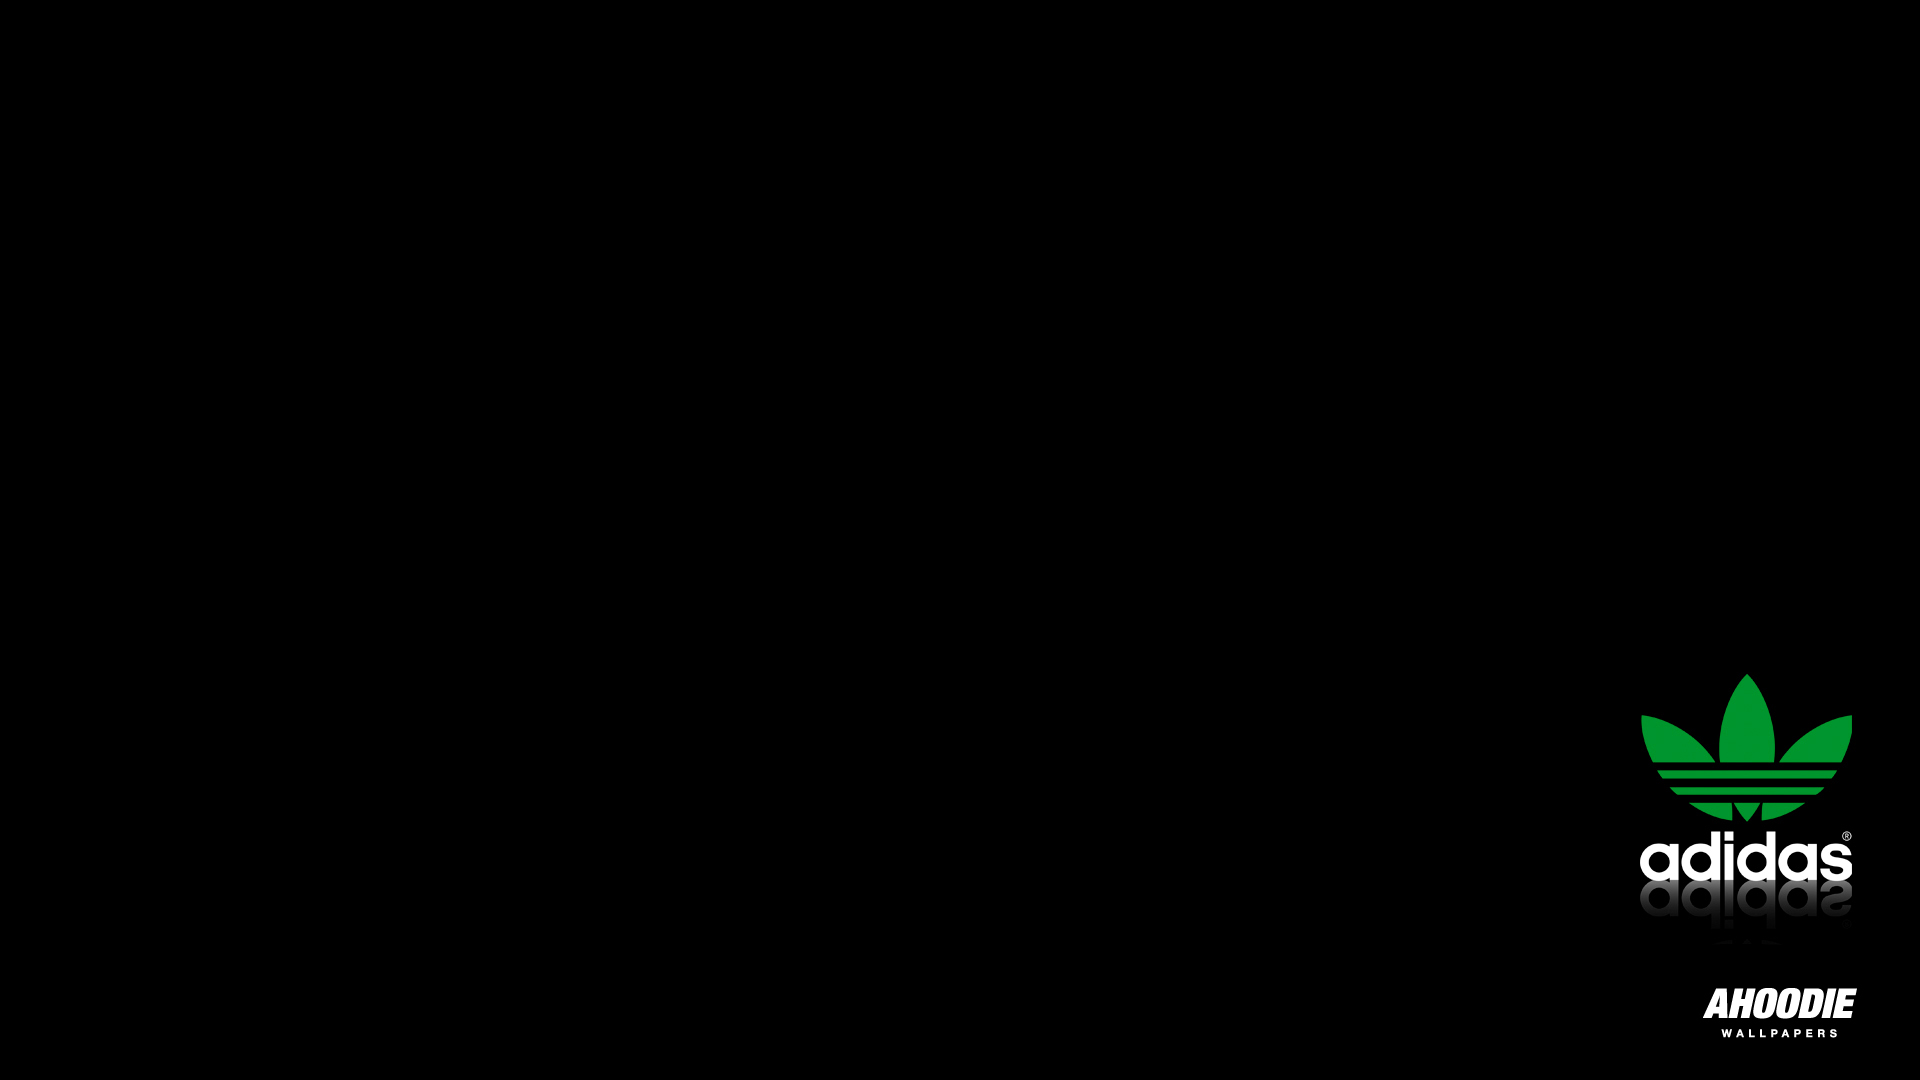 Adidas Wallpaper 1920x1080 1920x1080